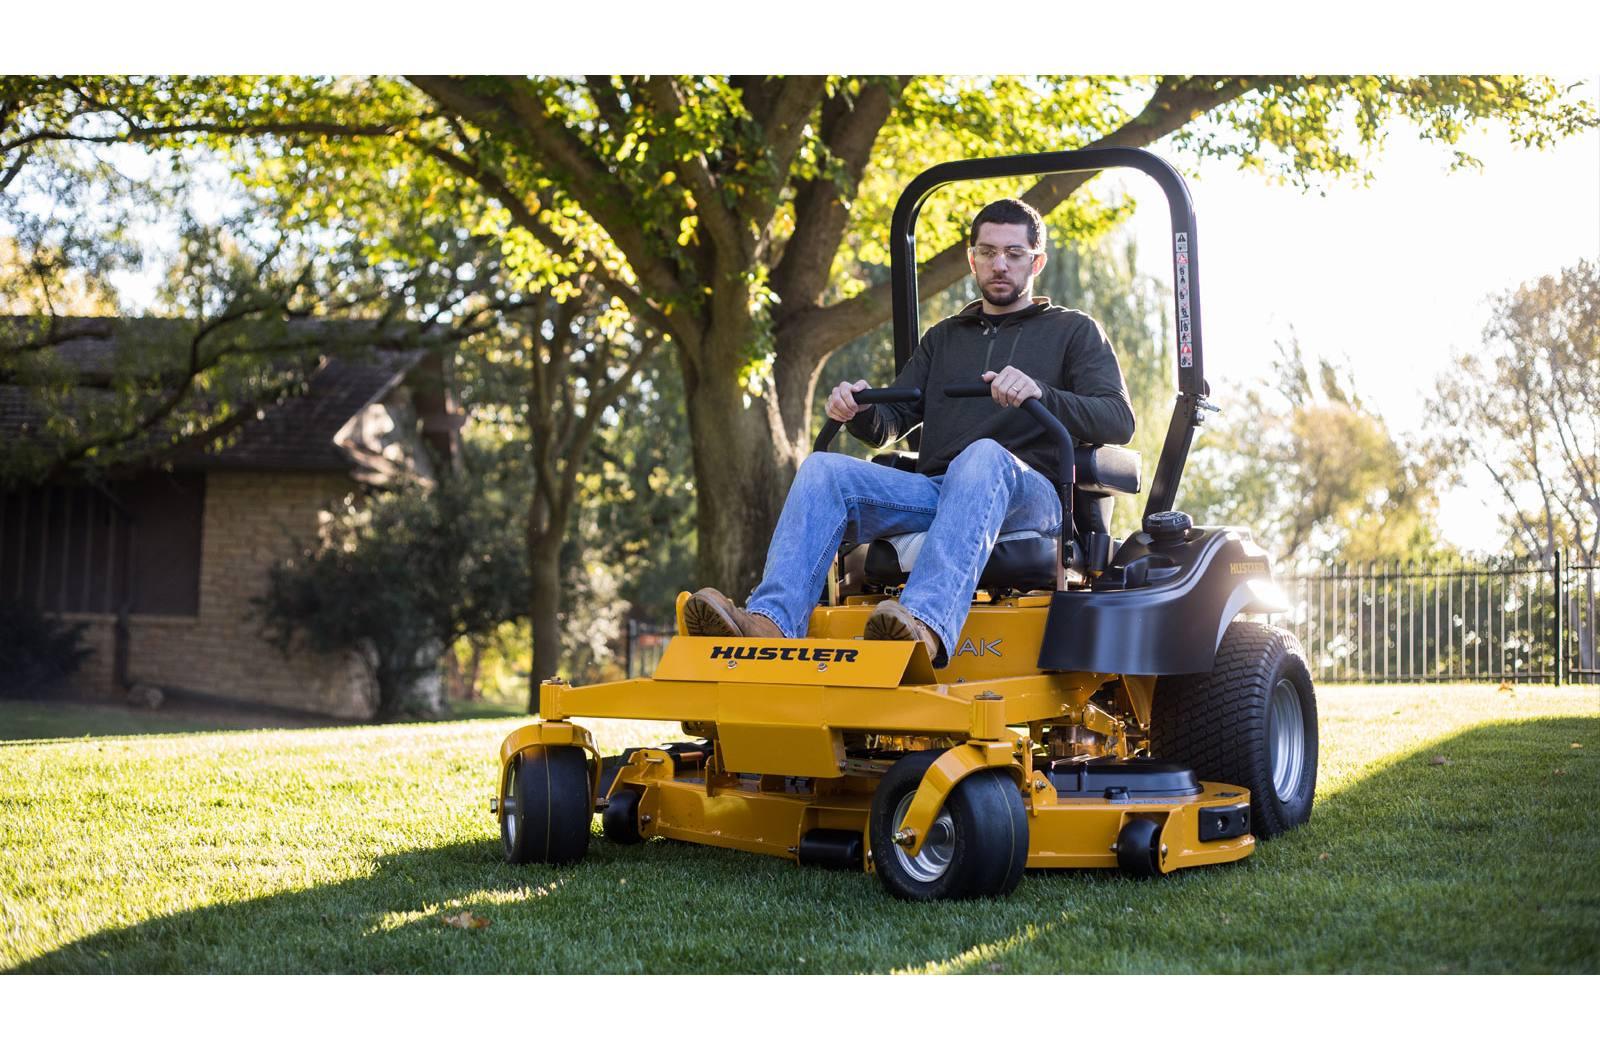 Apologise, hustler fastrak lawn tractors consider